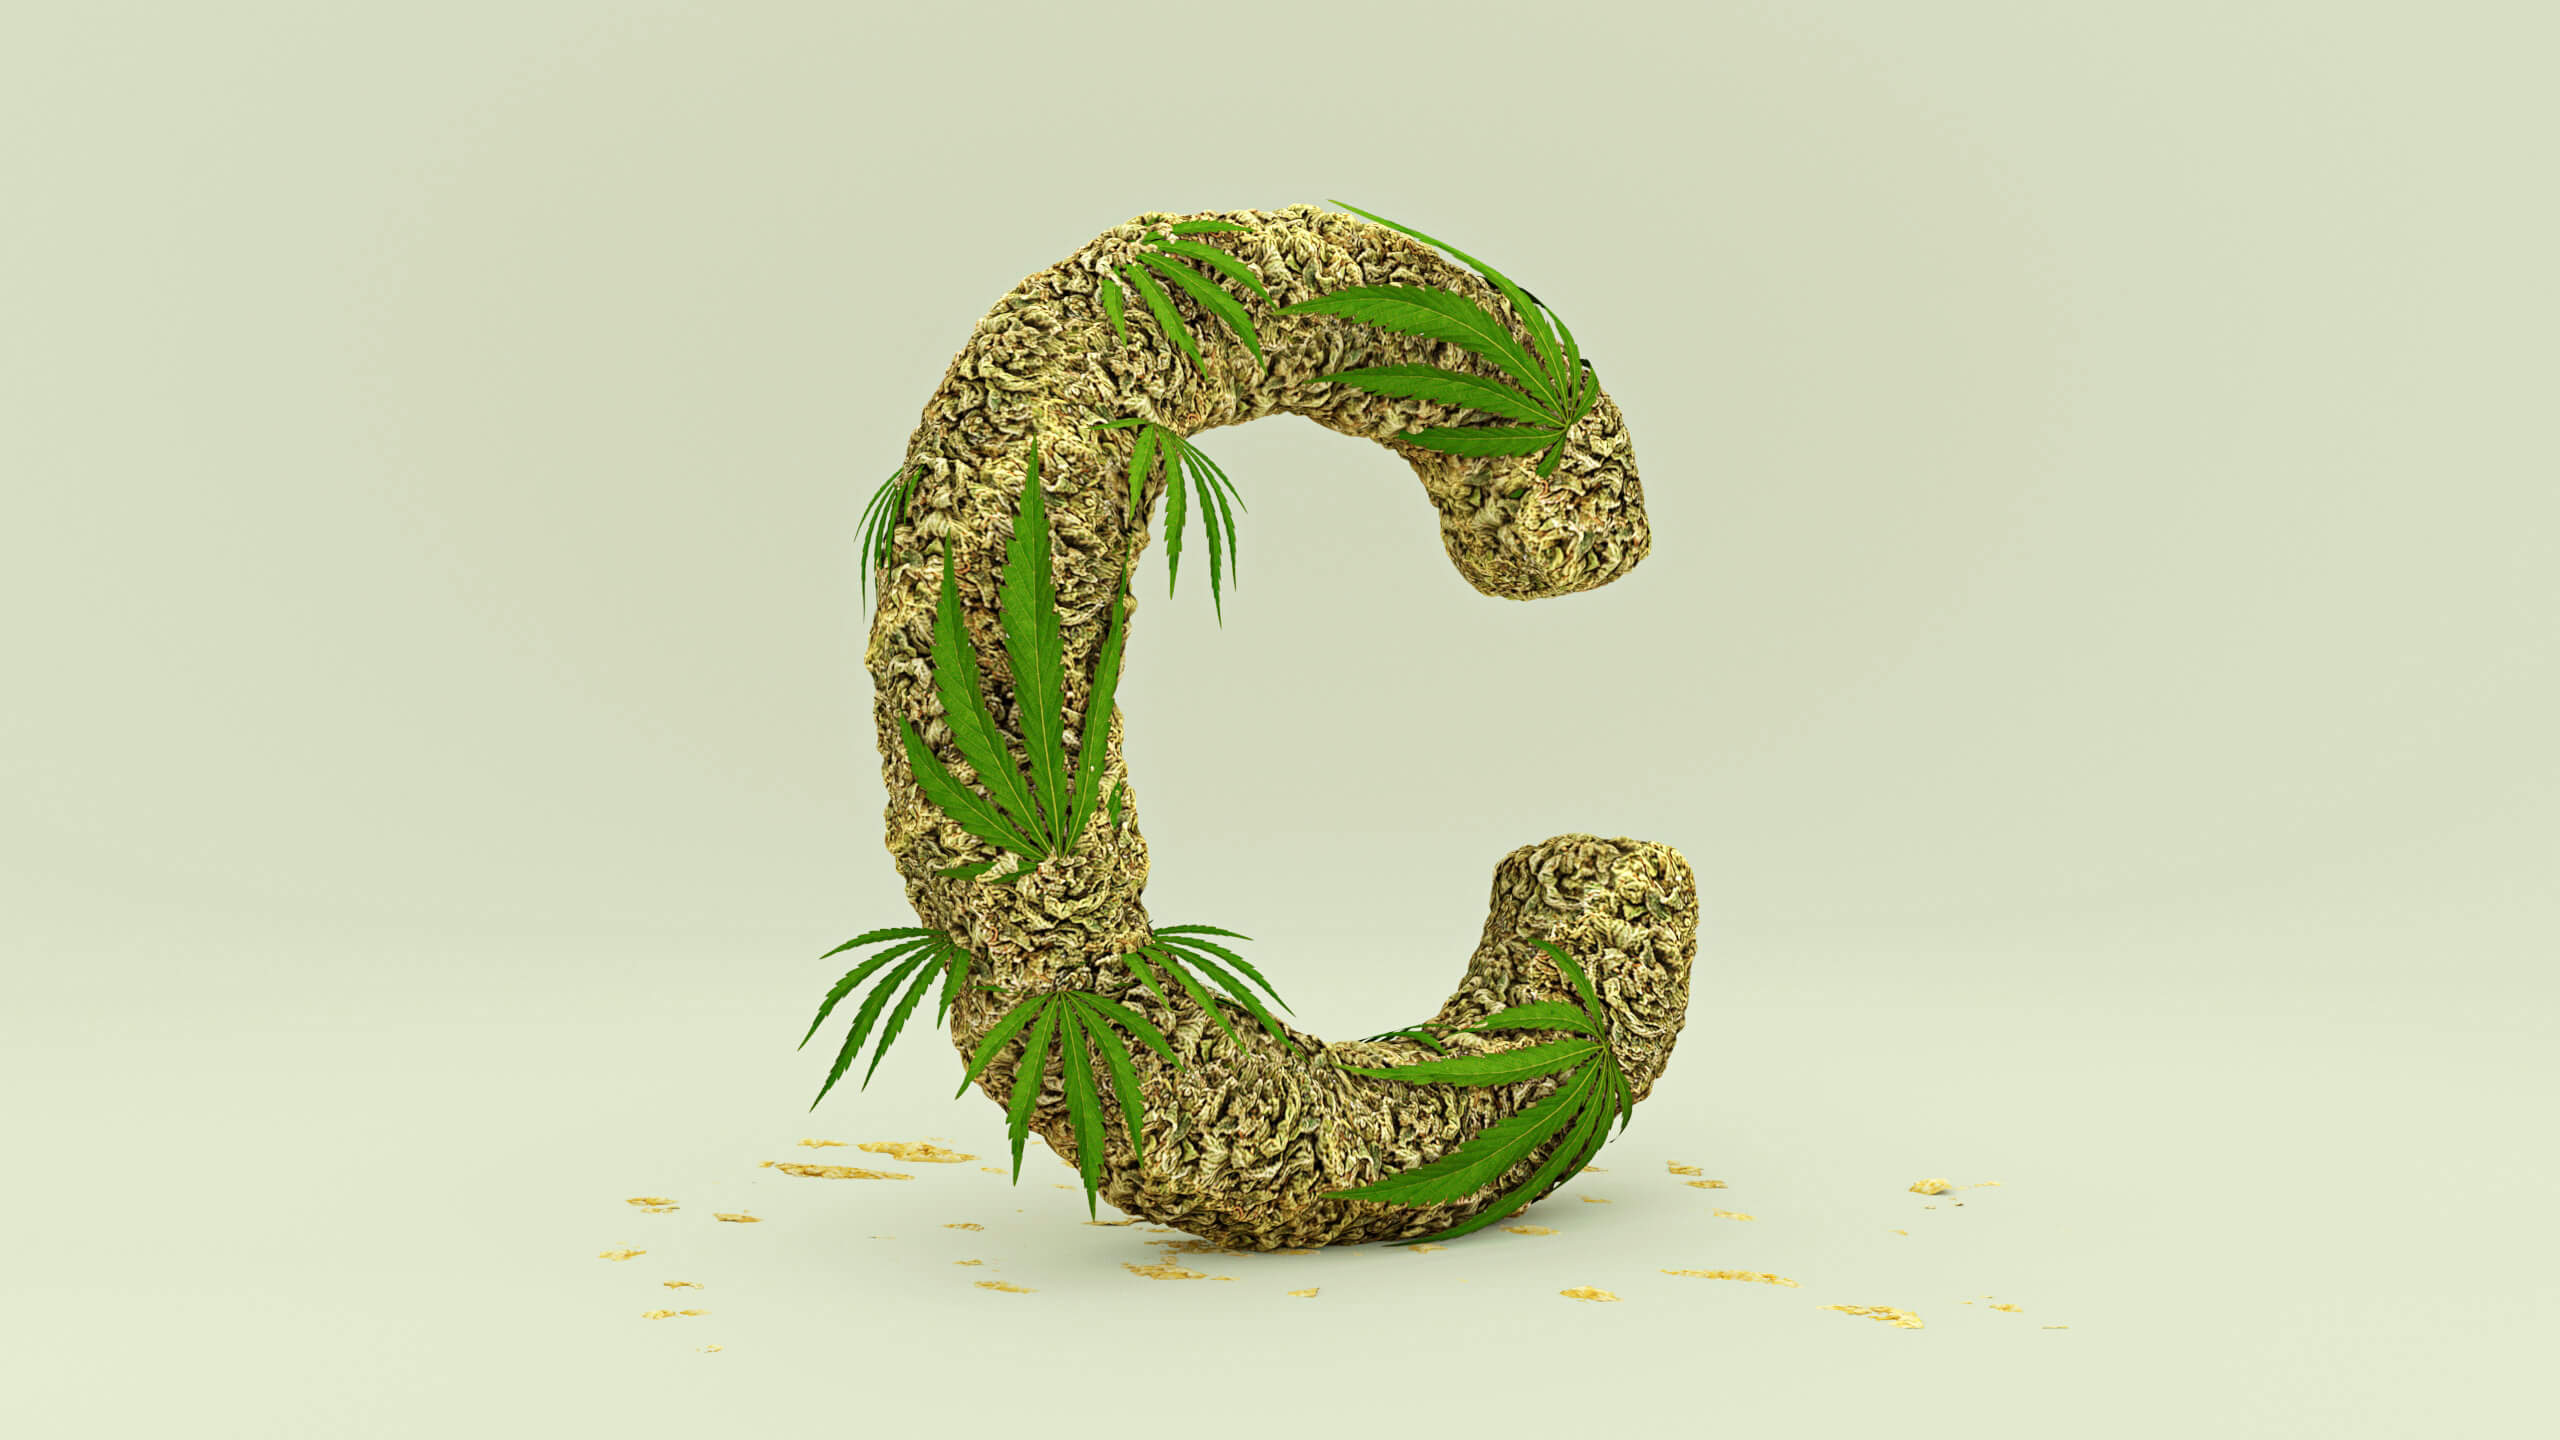 Buchstabe C symbolhaft umgesetzt